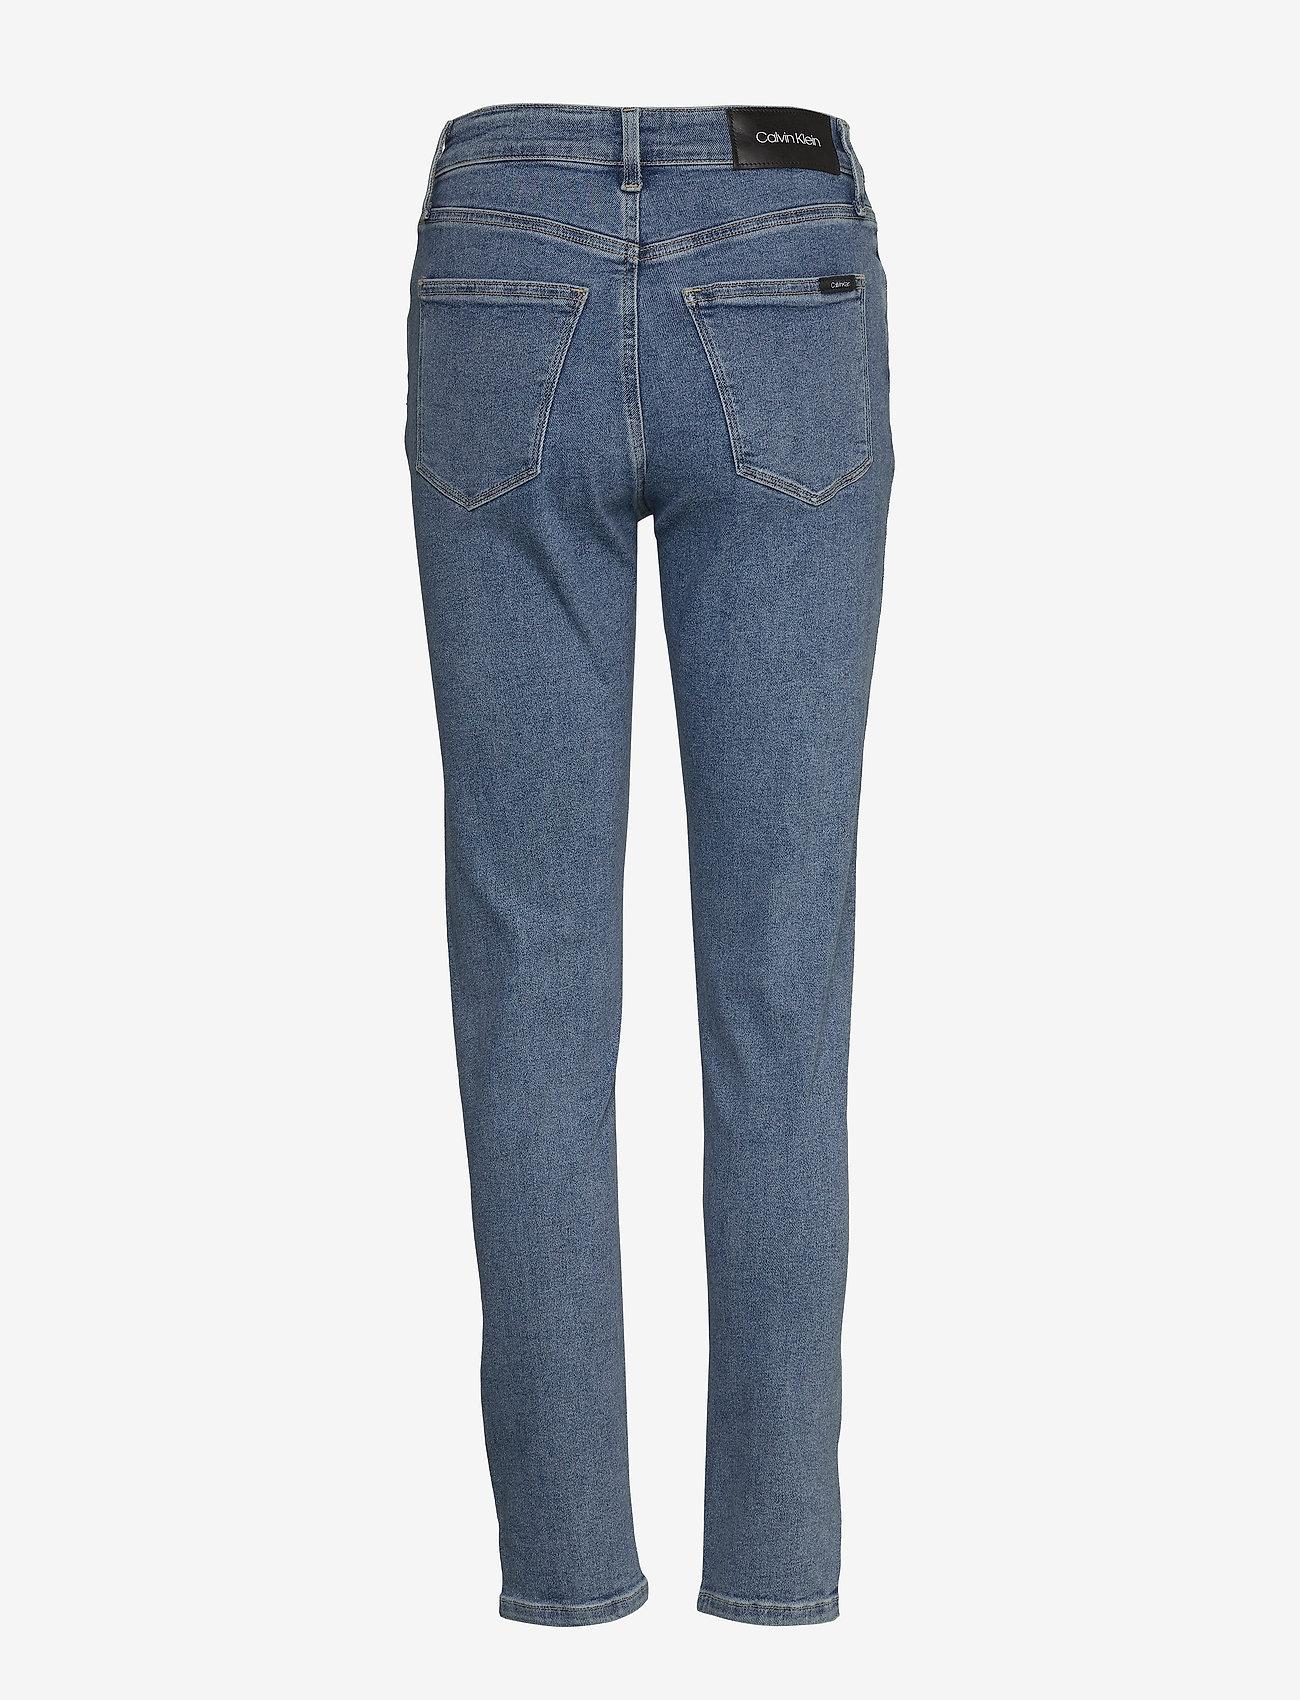 High Rise Slim Pant (Natal Blue) - Calvin Klein XMDlWZ